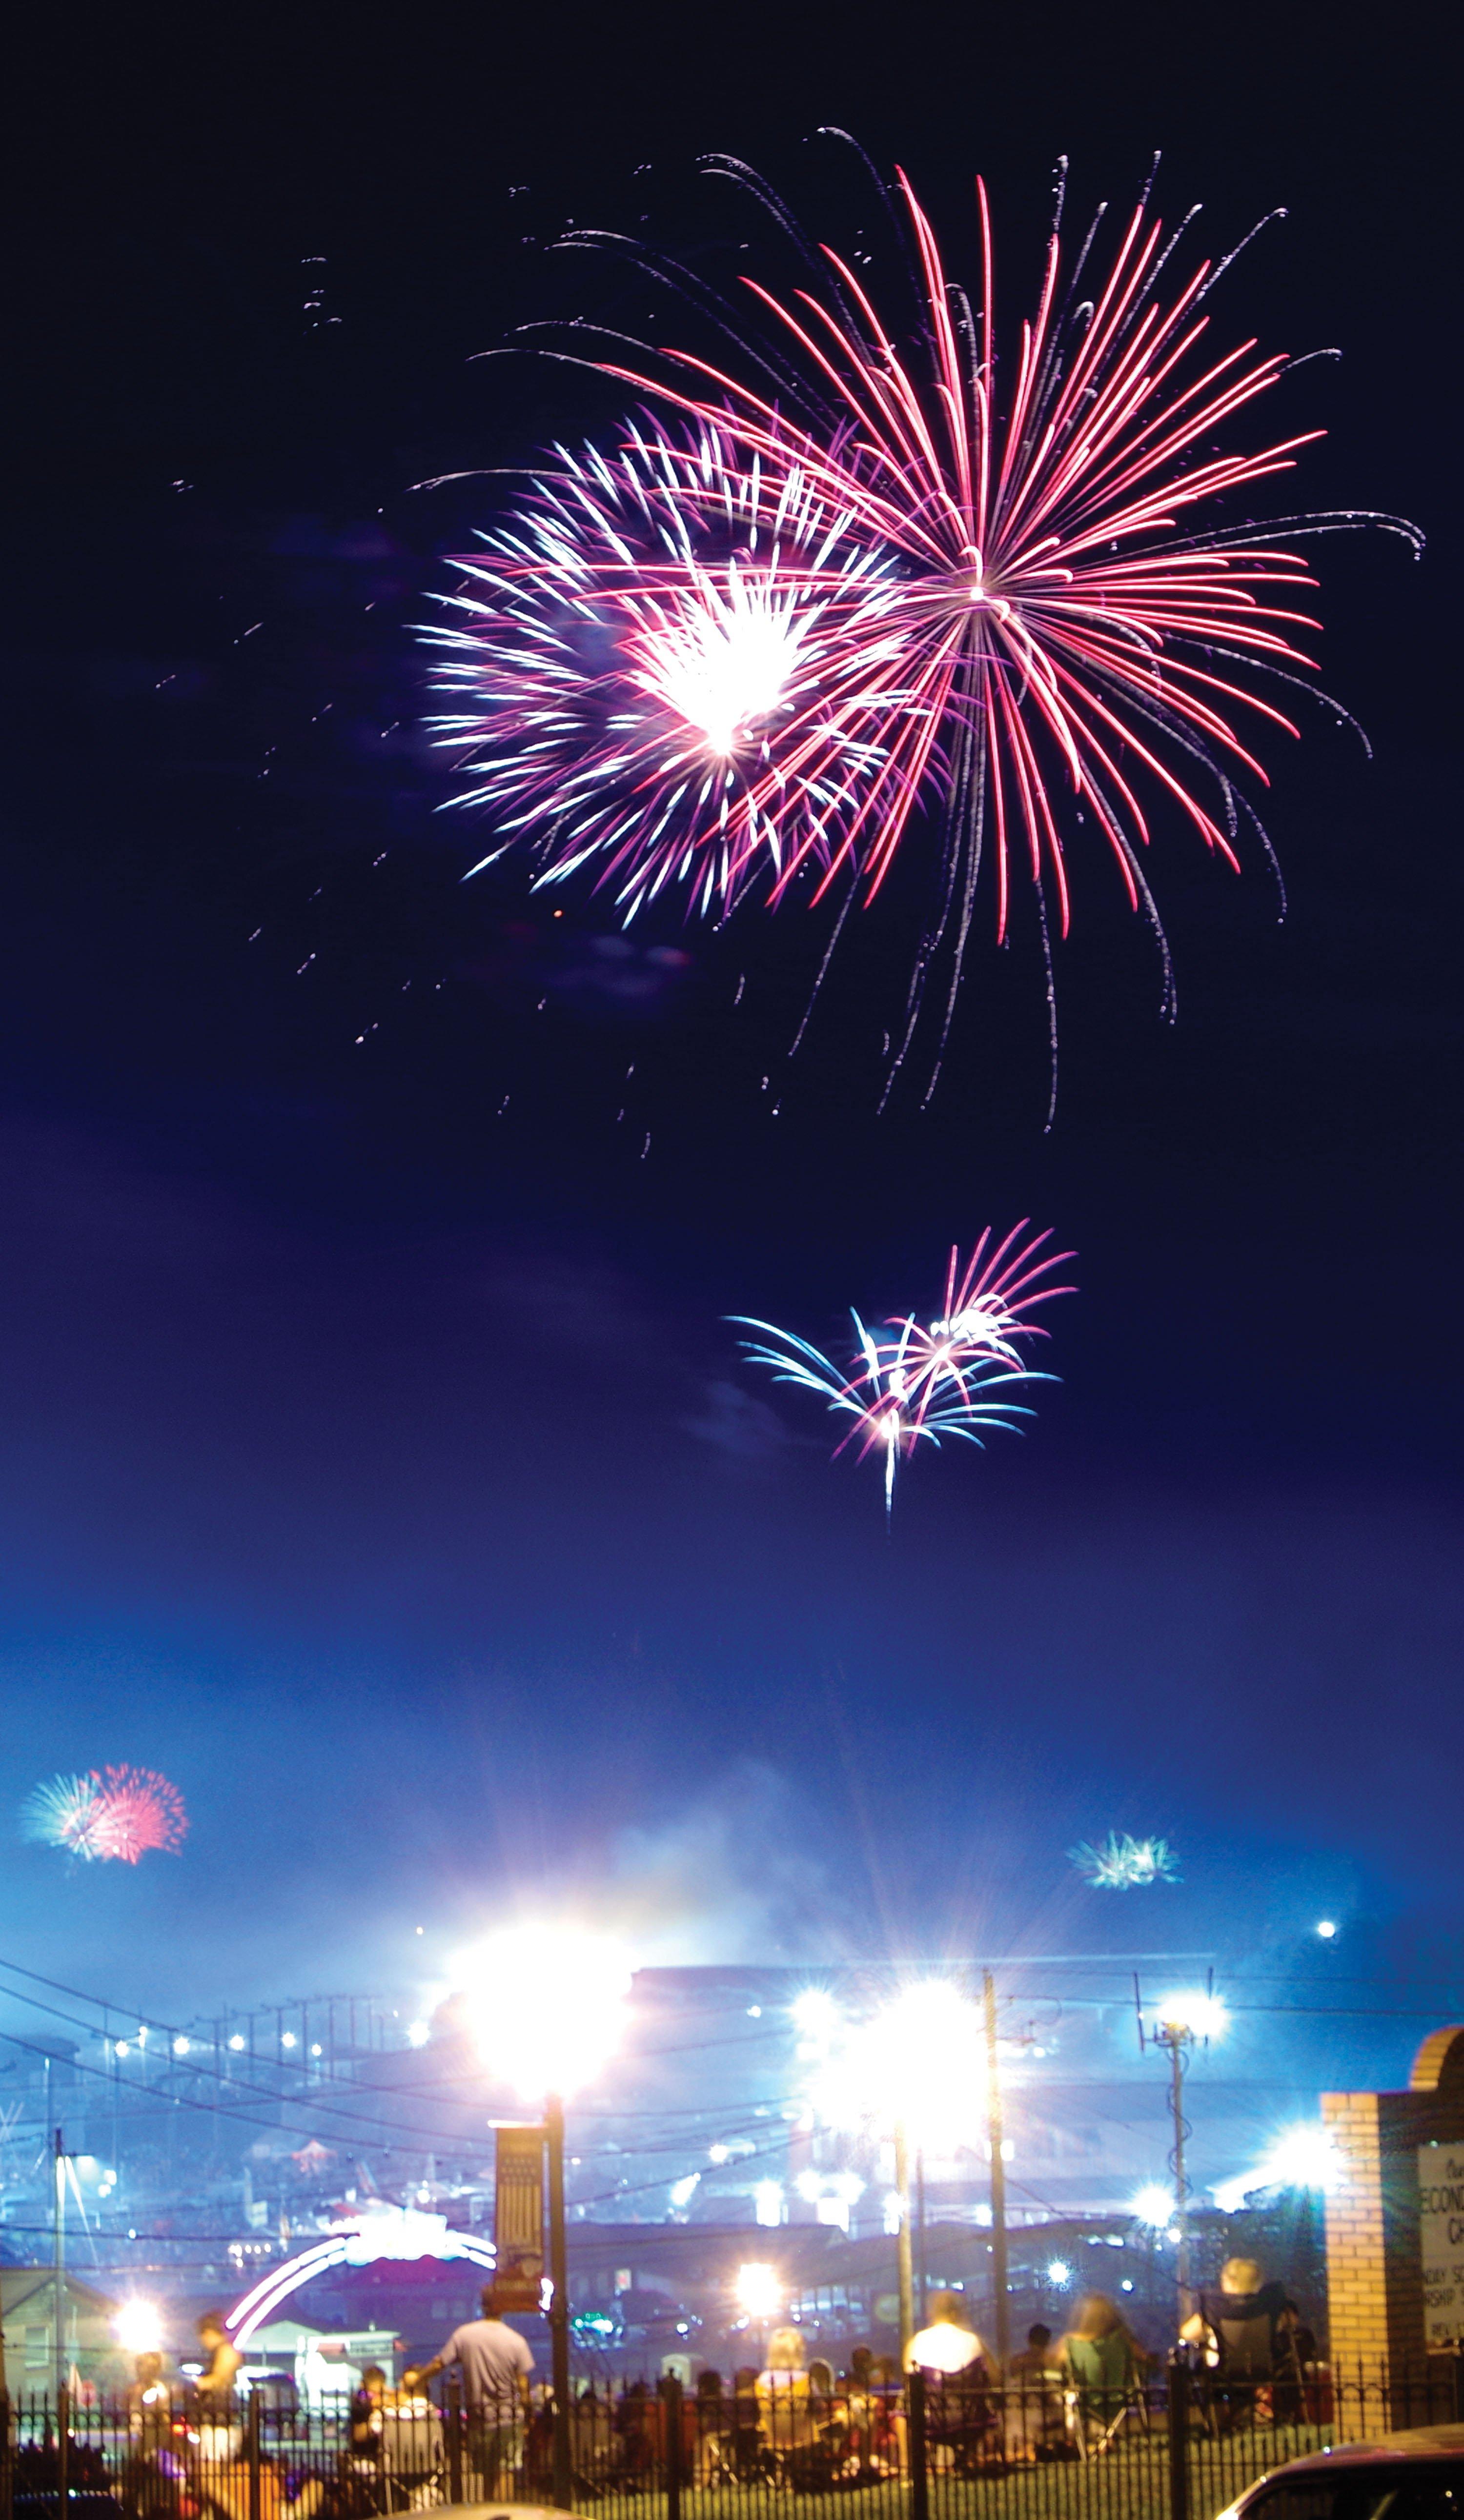 Fireworks 2019 5